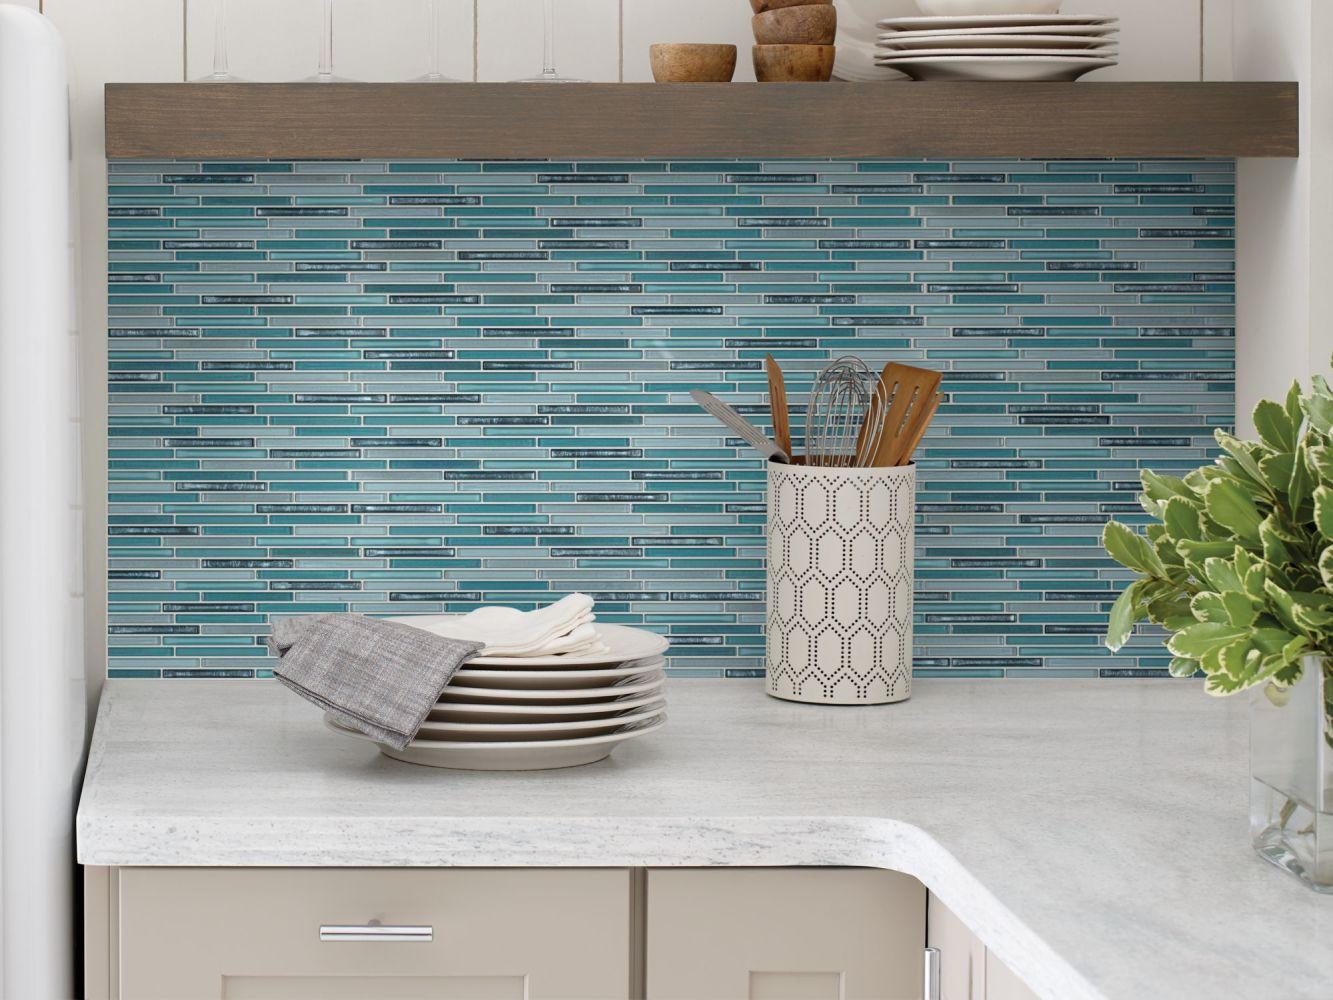 Shaw Floors Home Fn Gold Ceramic Molten Linear Glass Hydra 00460_TGJ83